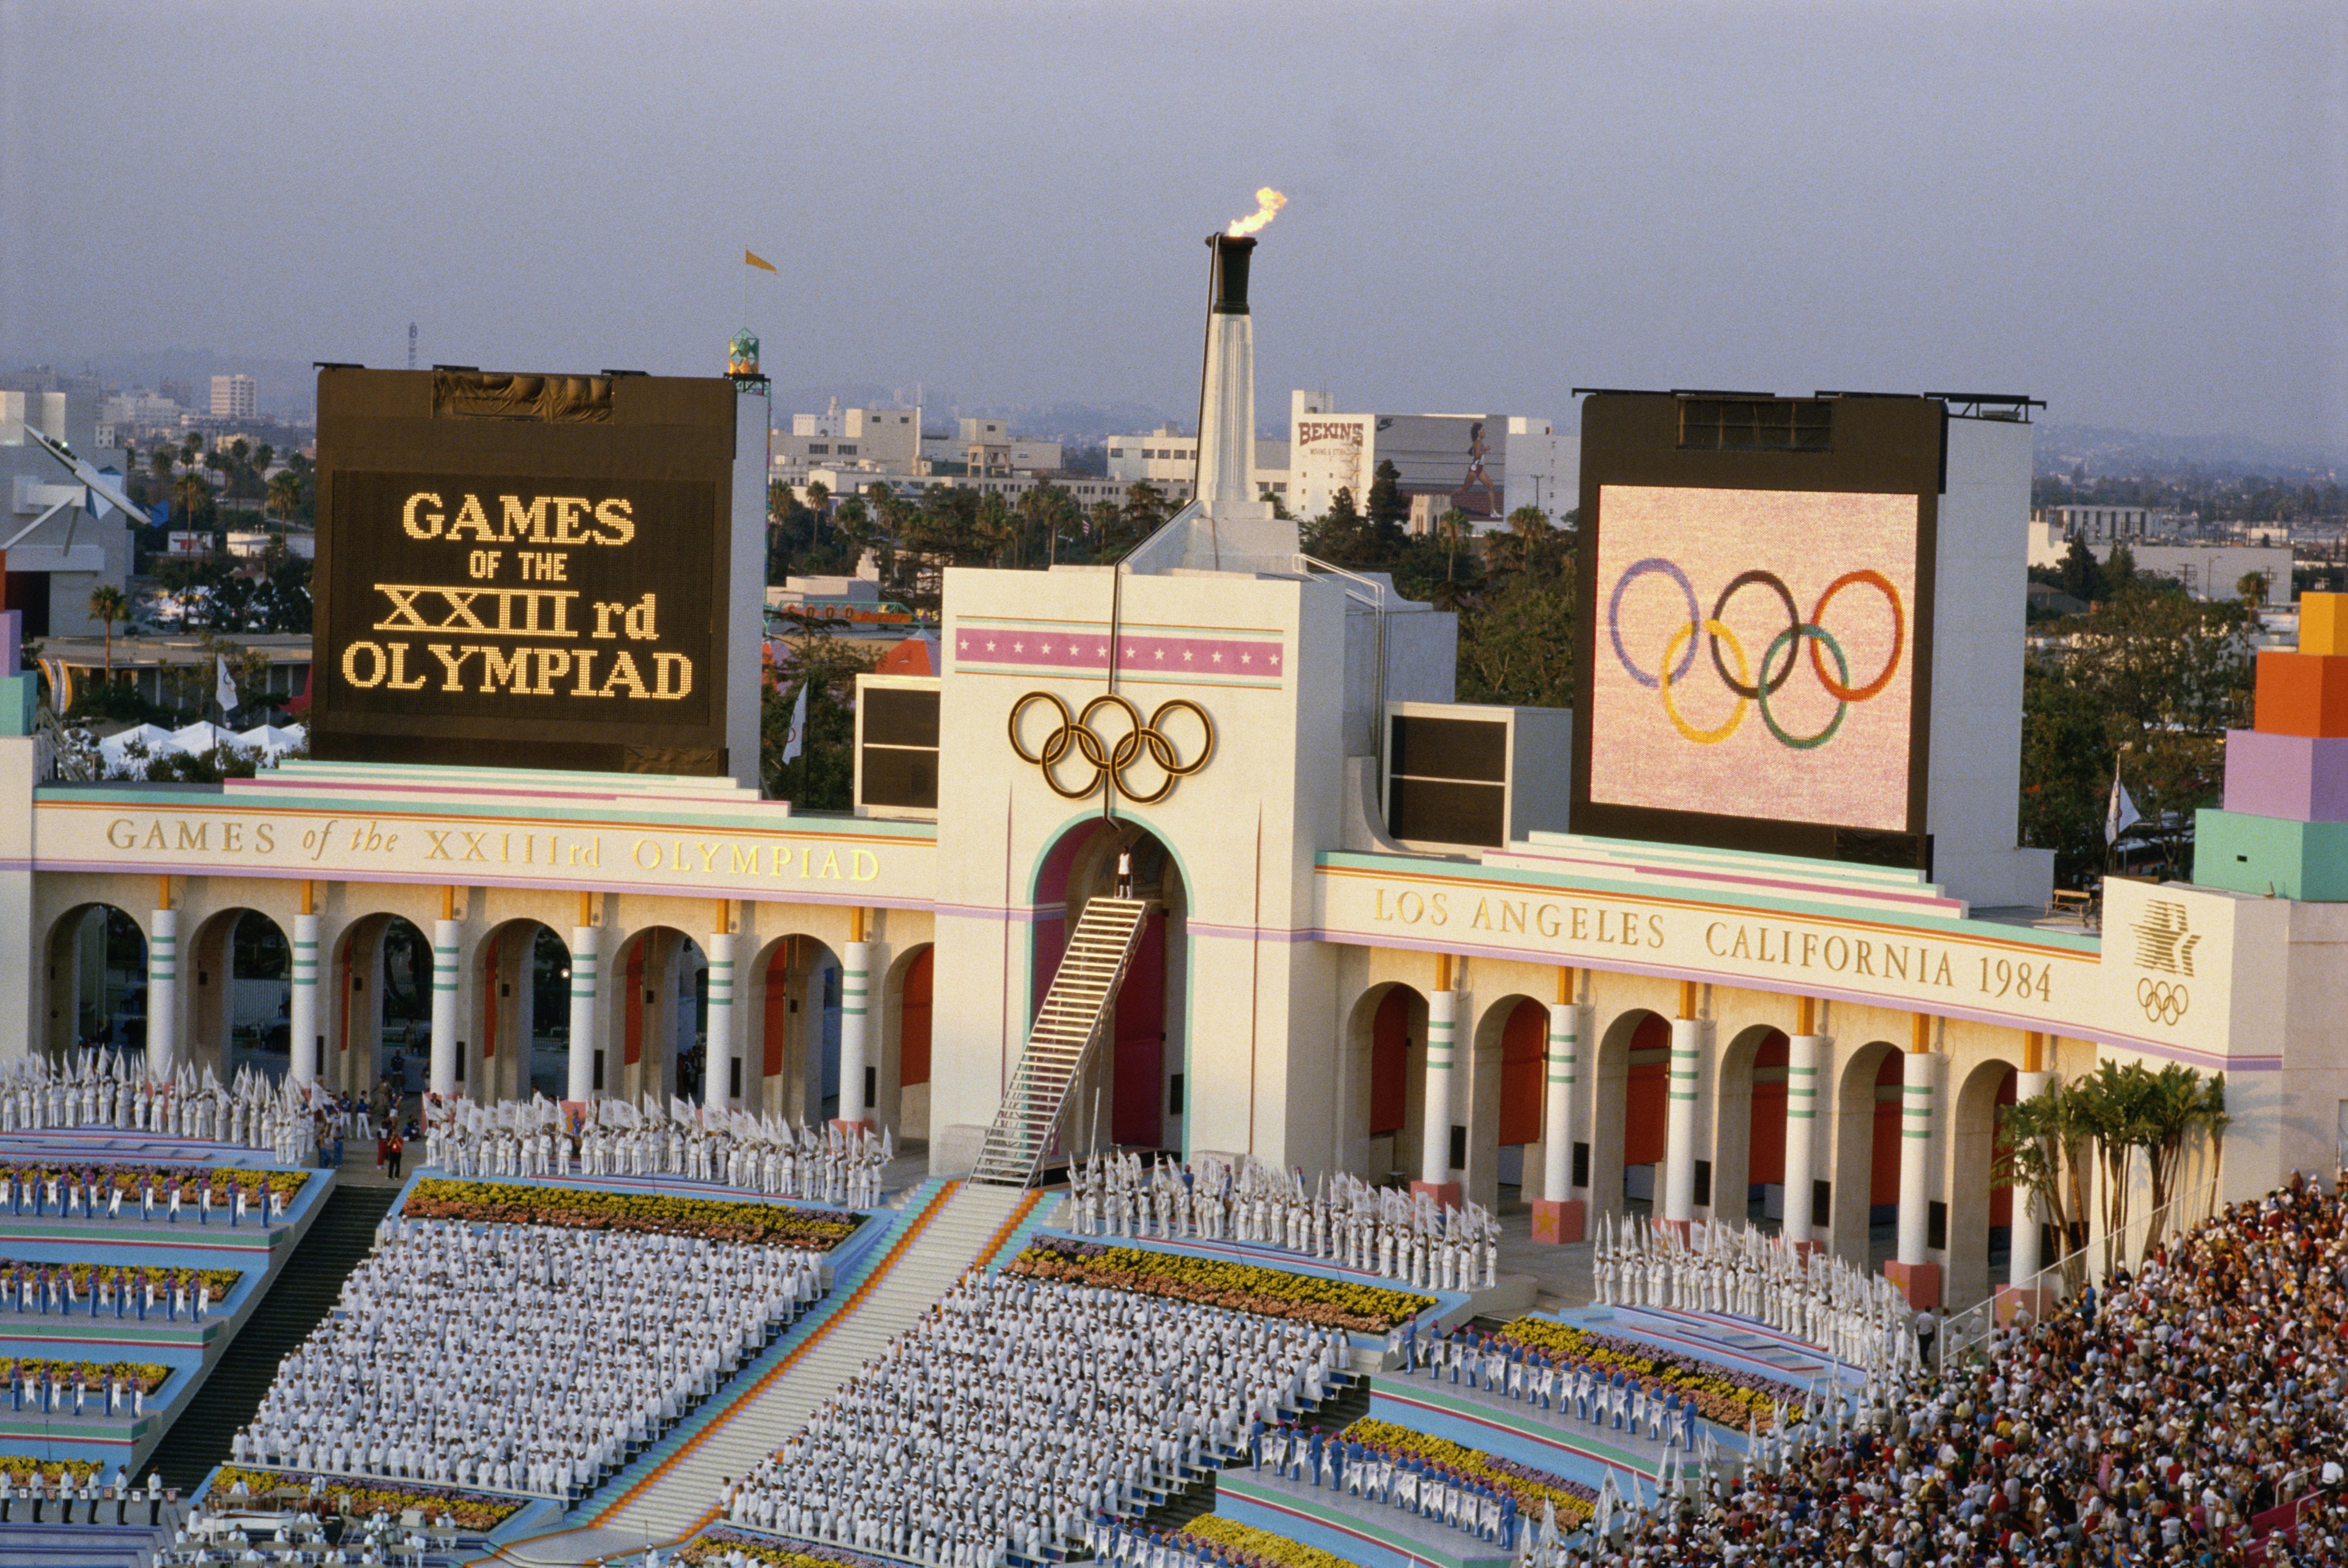 The 1984 Olympics